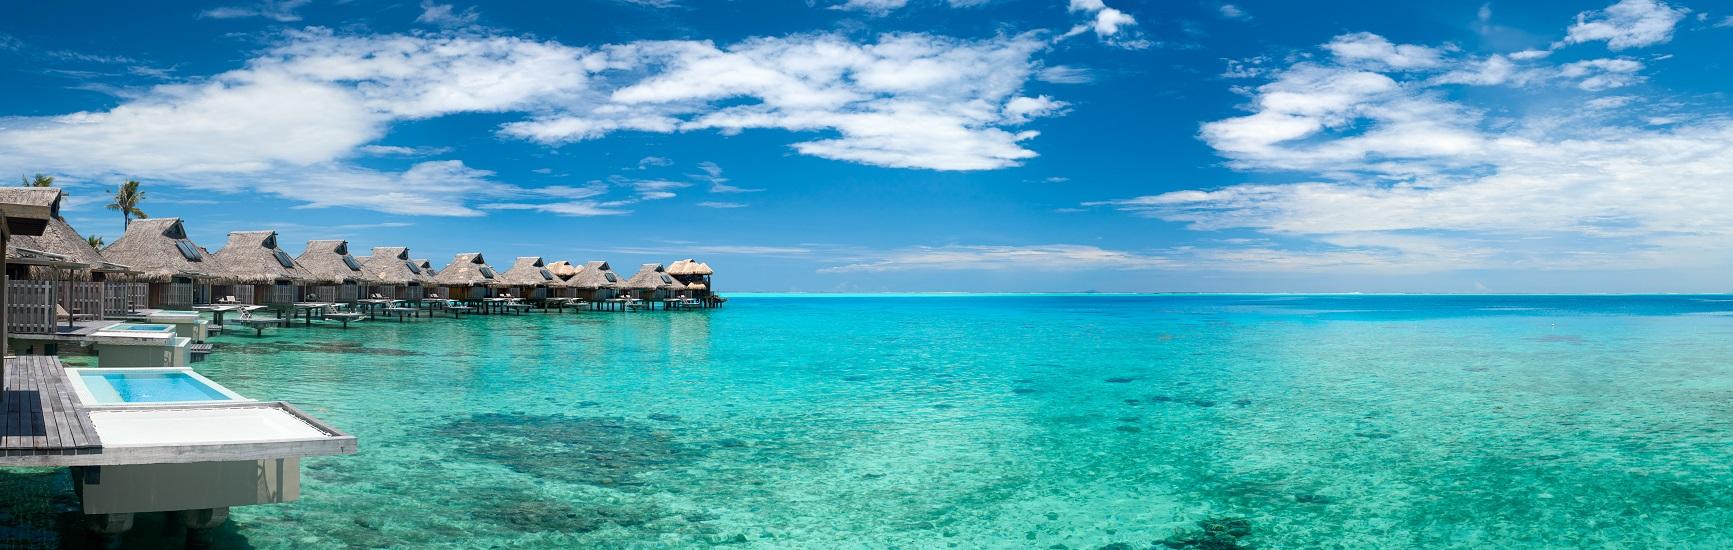 https://tahititourisme.ch/wp-content/uploads/2017/09/HERBERGEMENT-Conrad-Bora-Bora-Nui-3.jpg